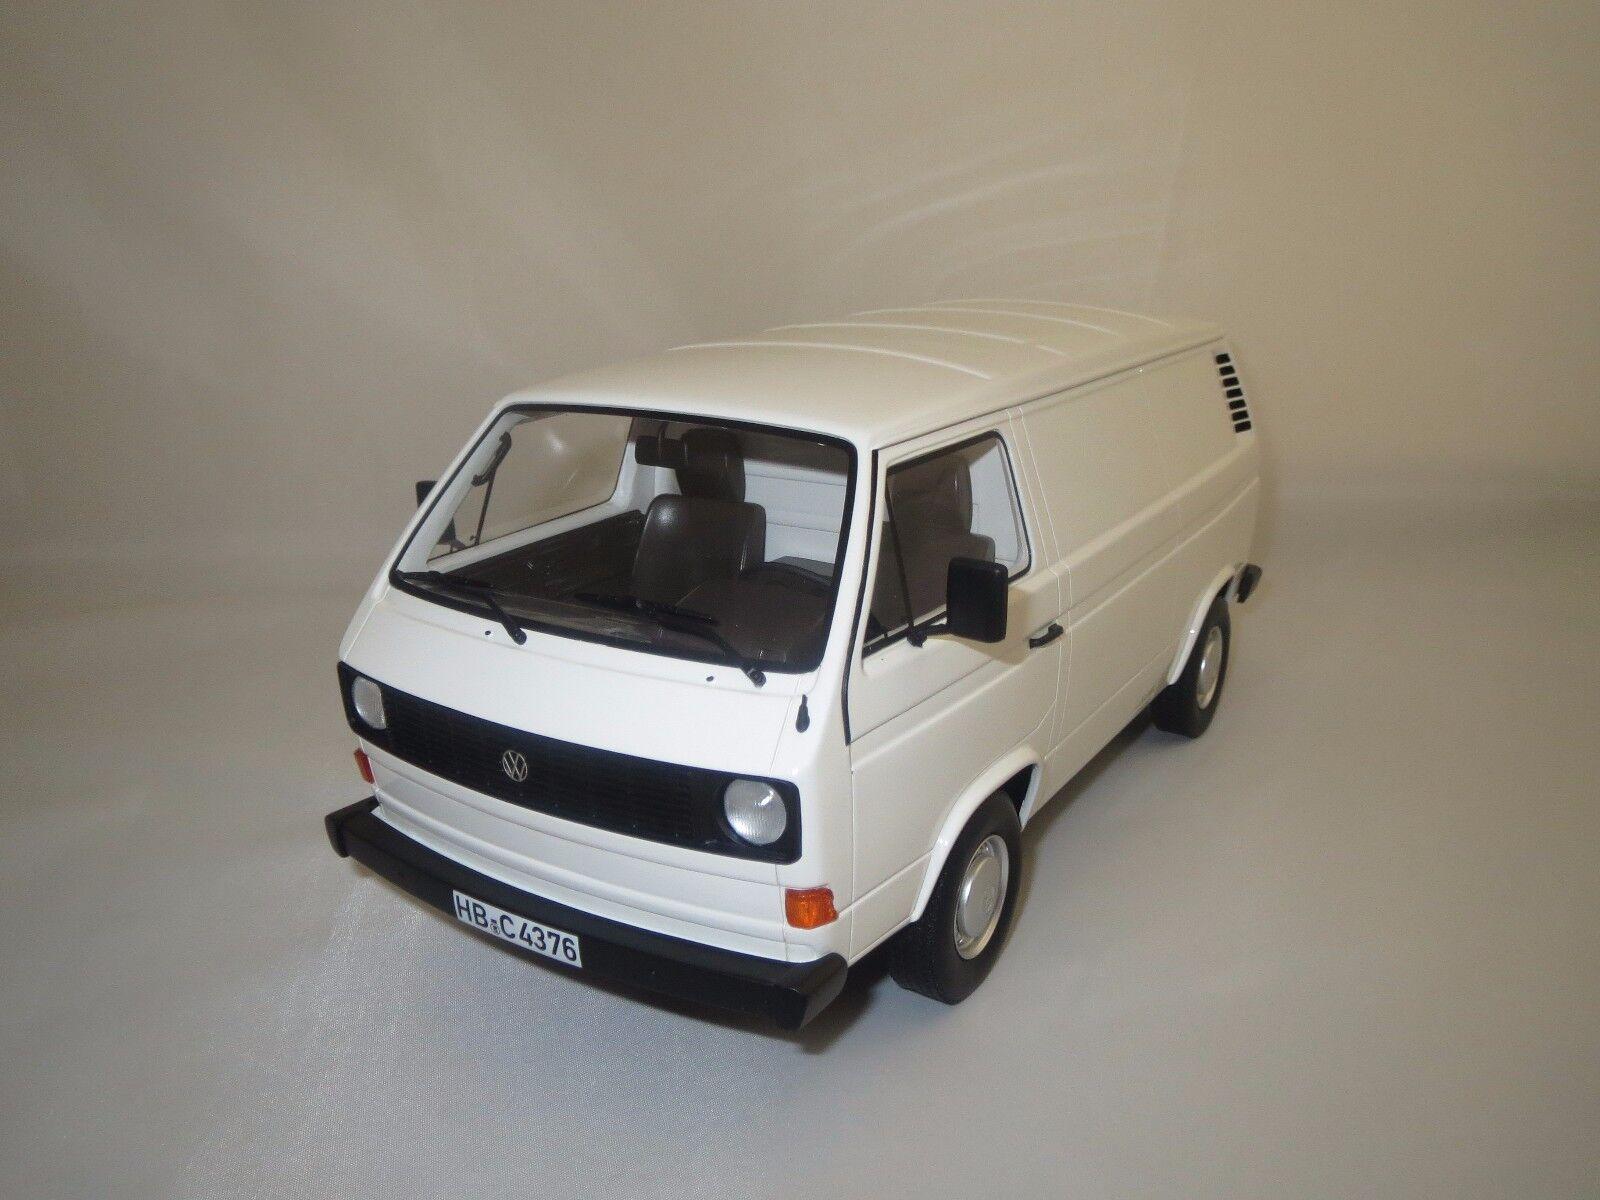 BOS Volkswagen t3a encadré  1979  (Blanc) 1 18 sans emballage